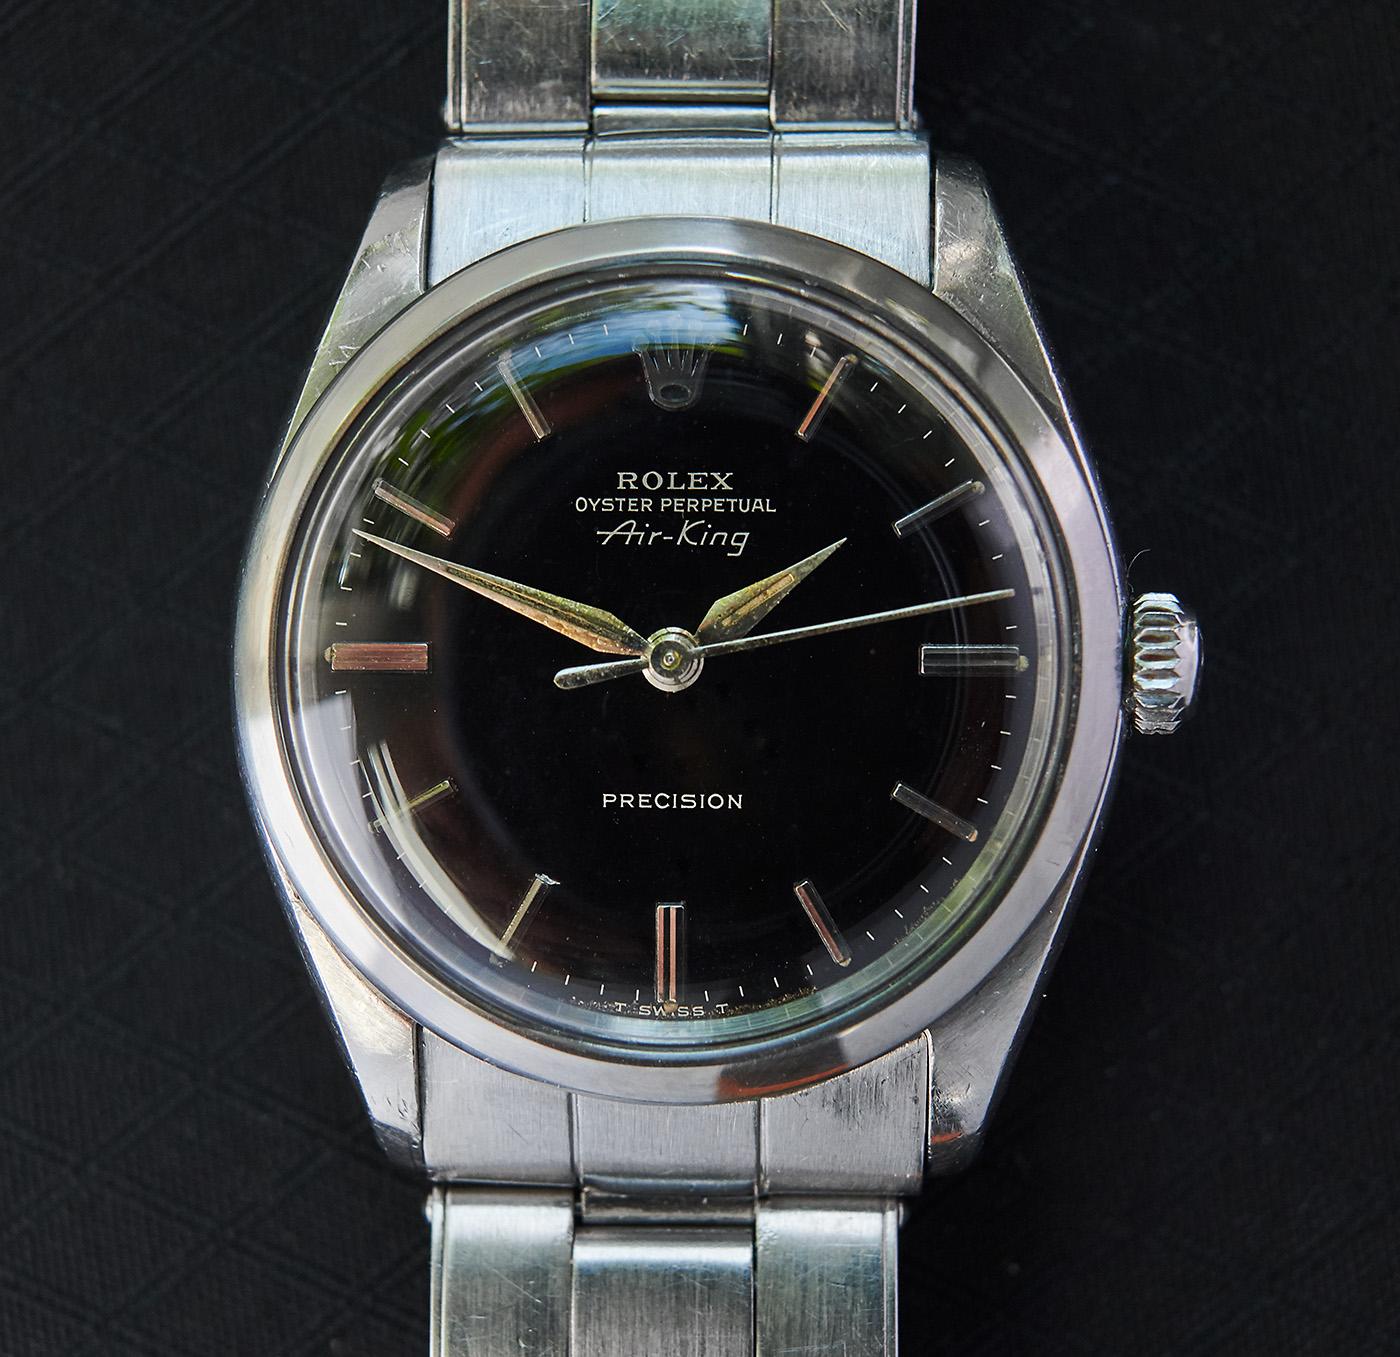 Rolex 5500 airking gilt/glossy dial